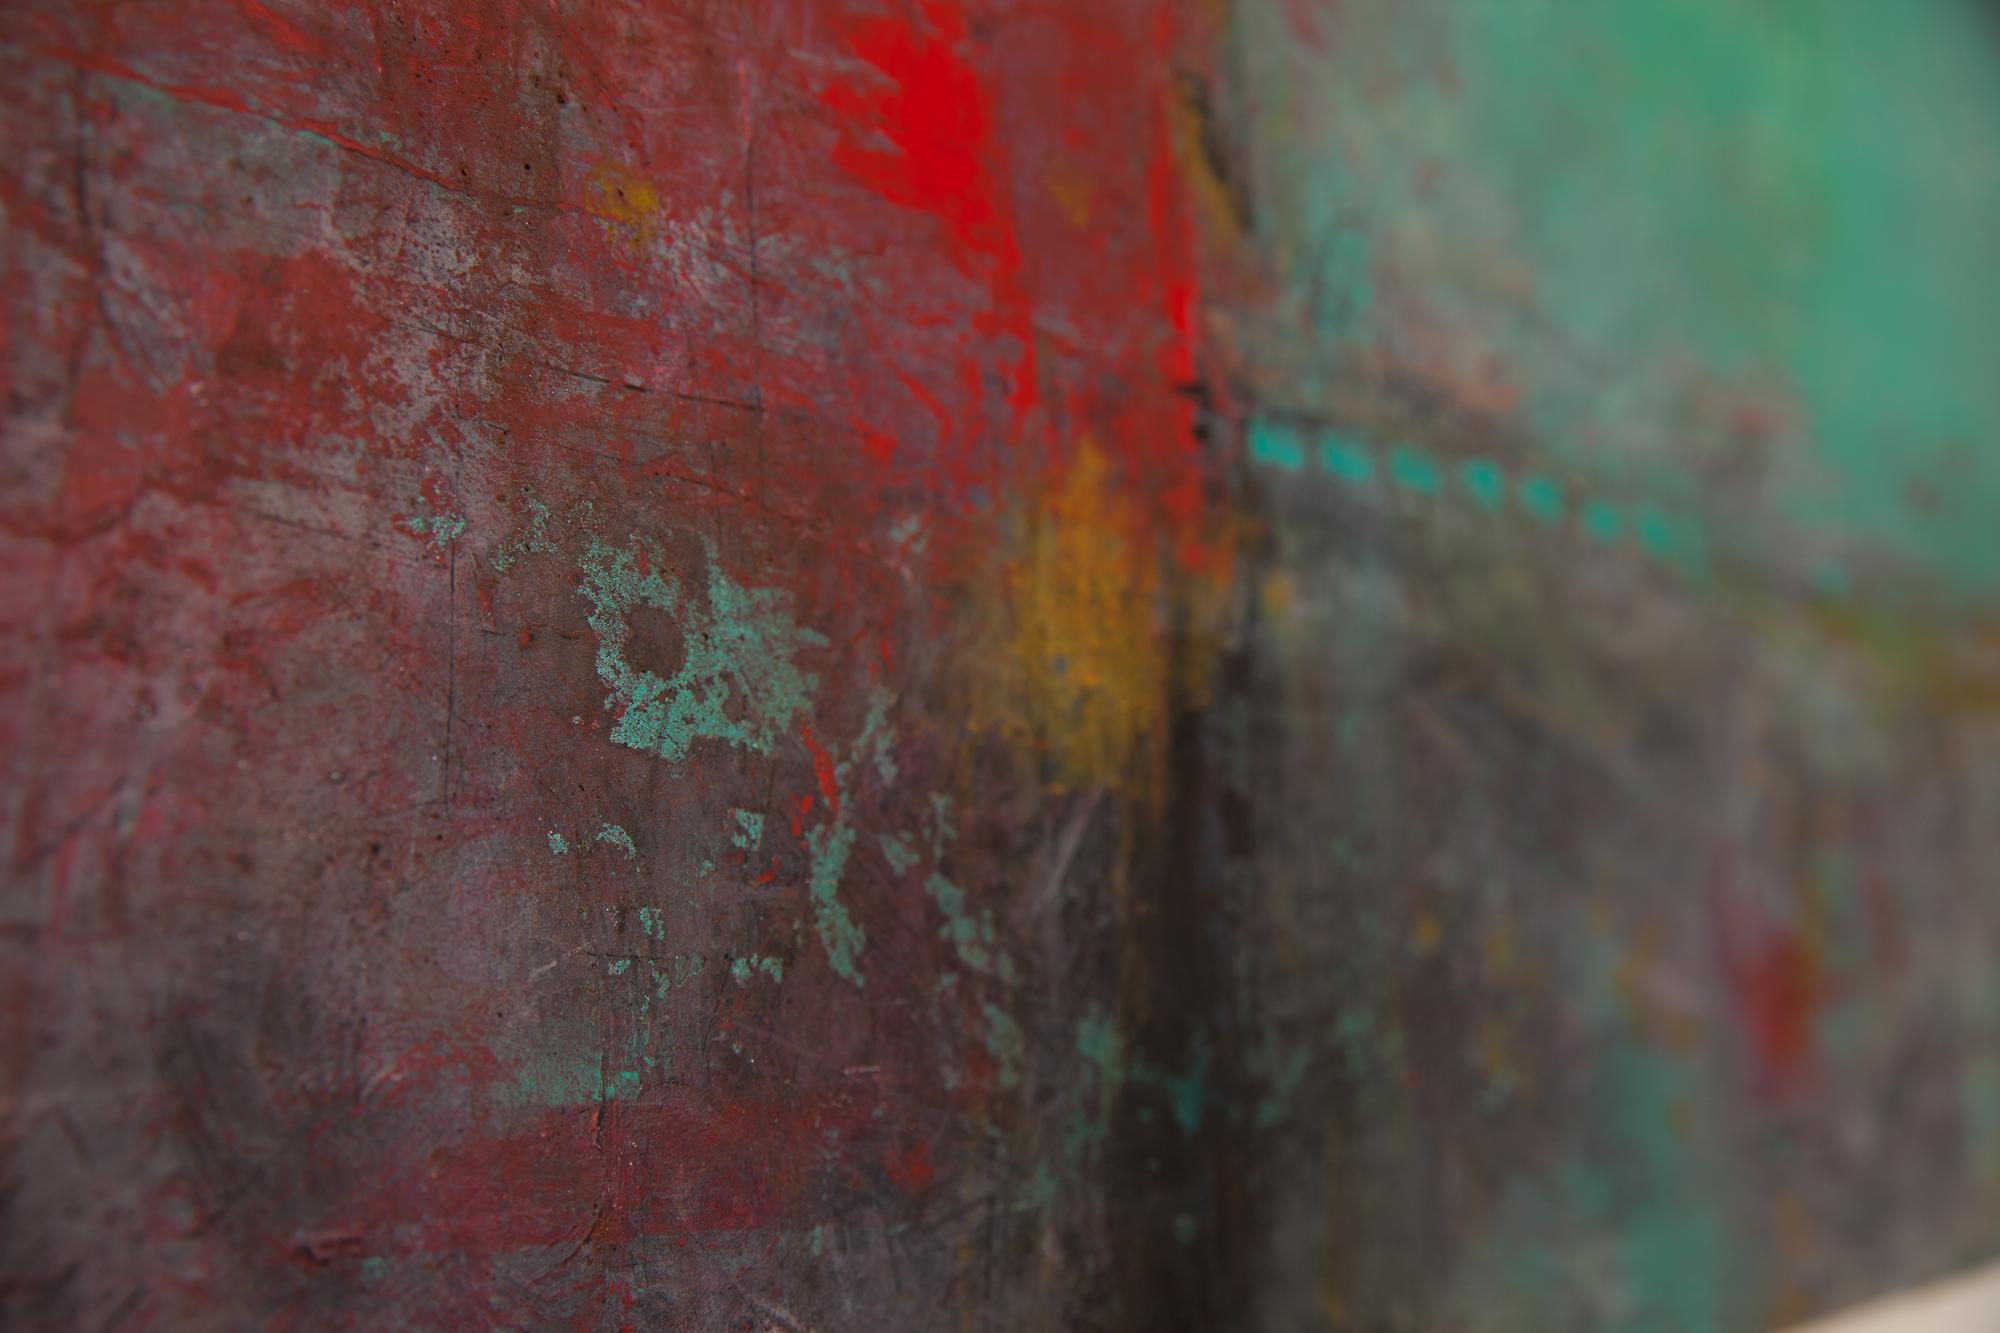 © Atelier DOL / Laure Deschandol All Rights Reserved